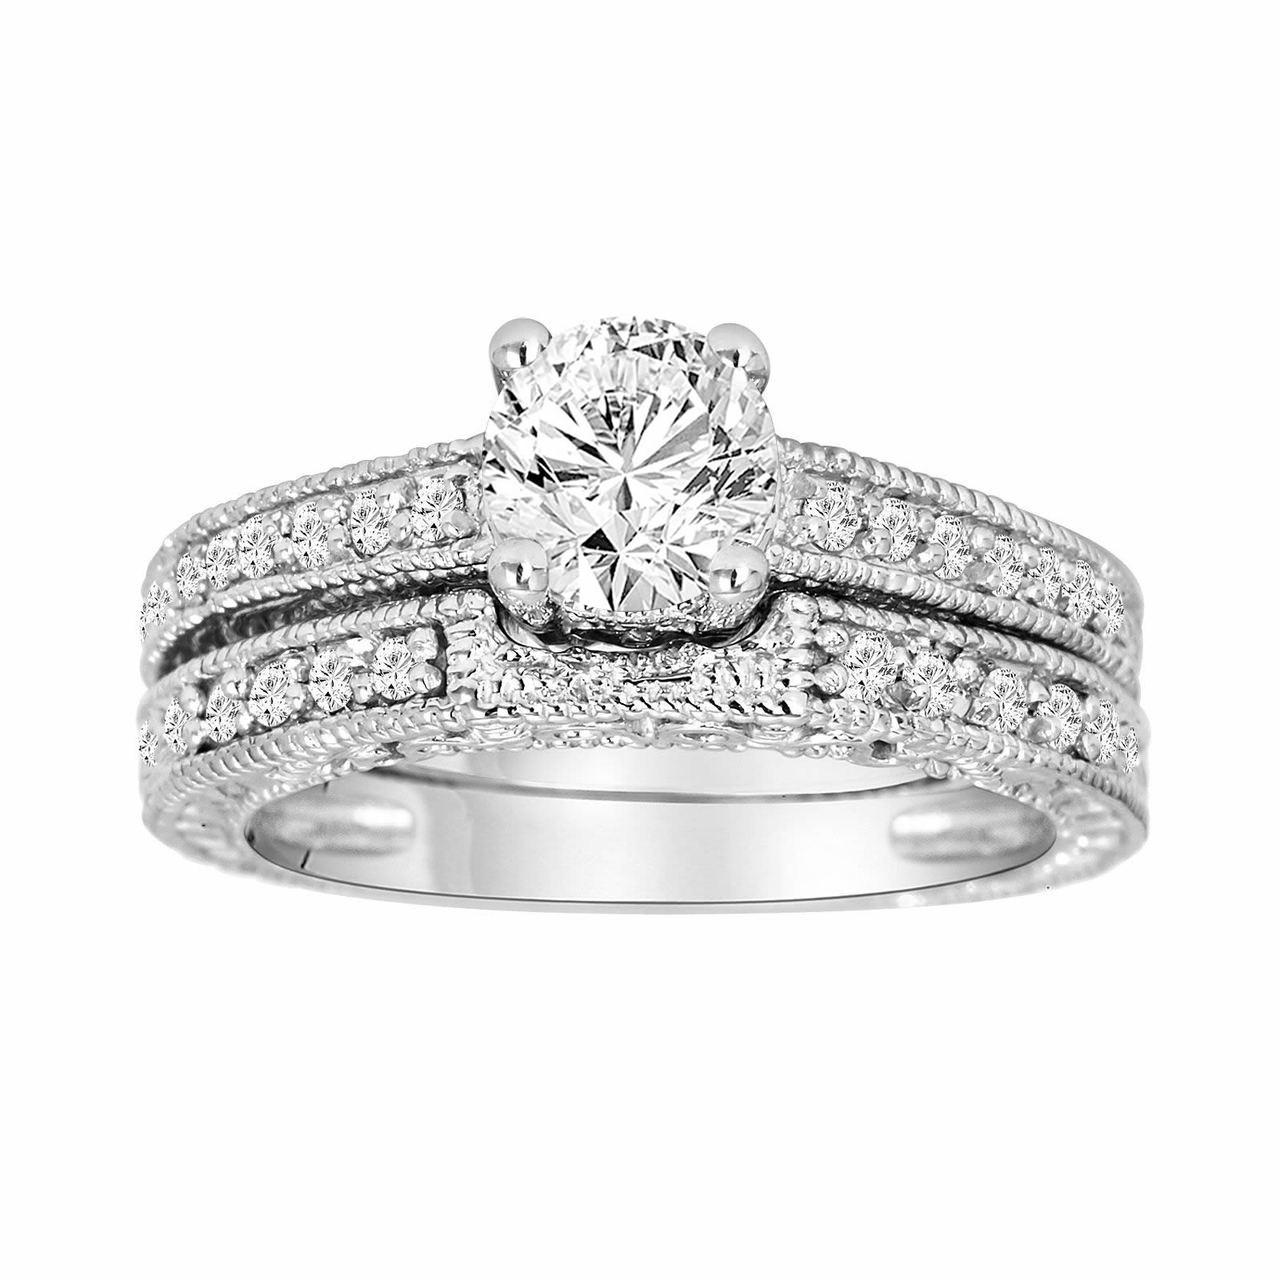 Engagement Rings Vintage Style: Diamond Engagement Ring And Wedding Band Sets 14K White